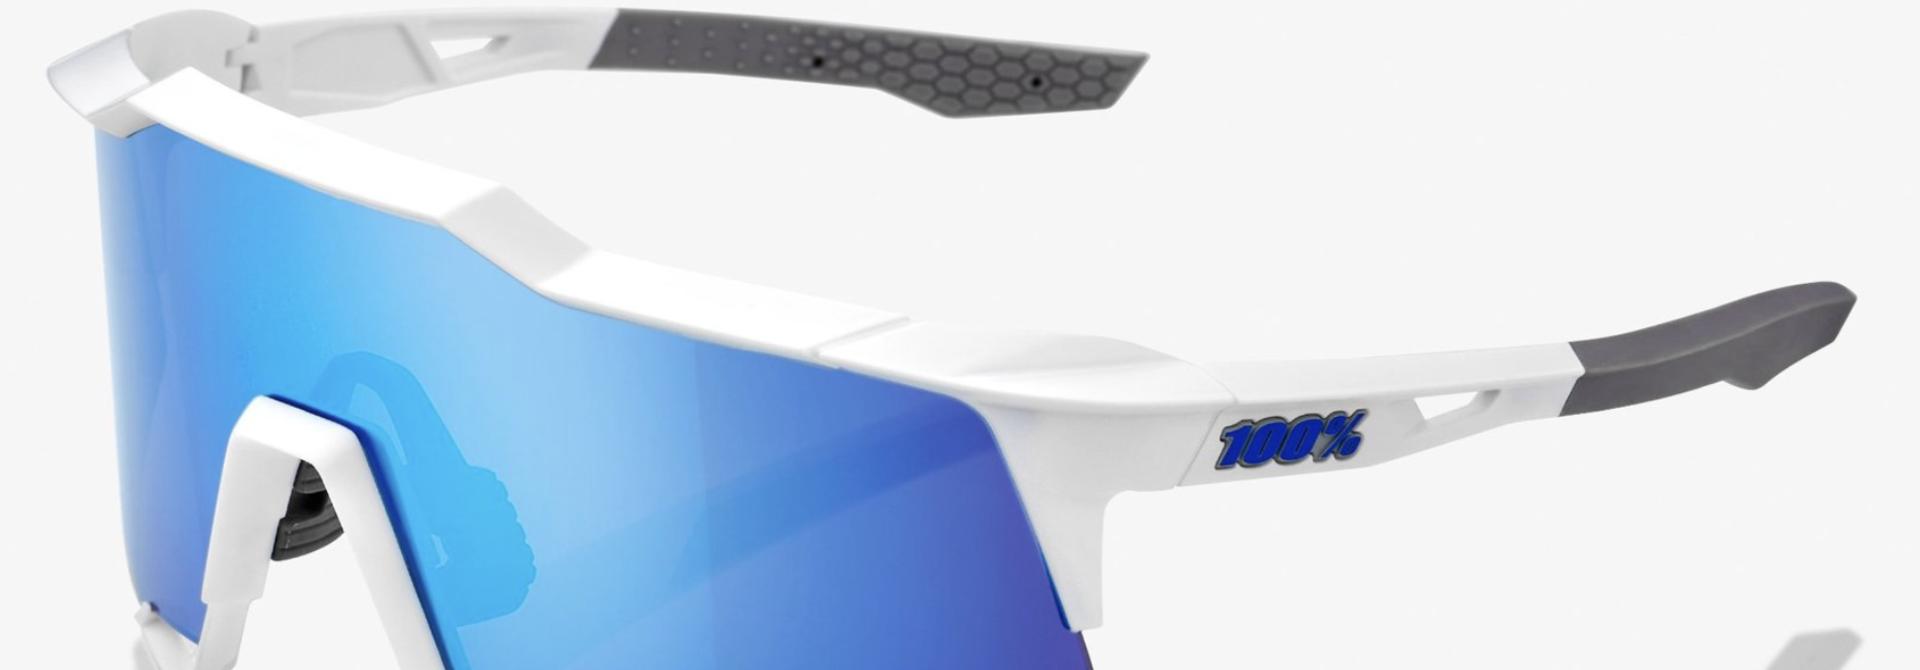 SpeedCraft Sunglasses, Matte White frame - HiPER Blue Multilayer Mirror Lens